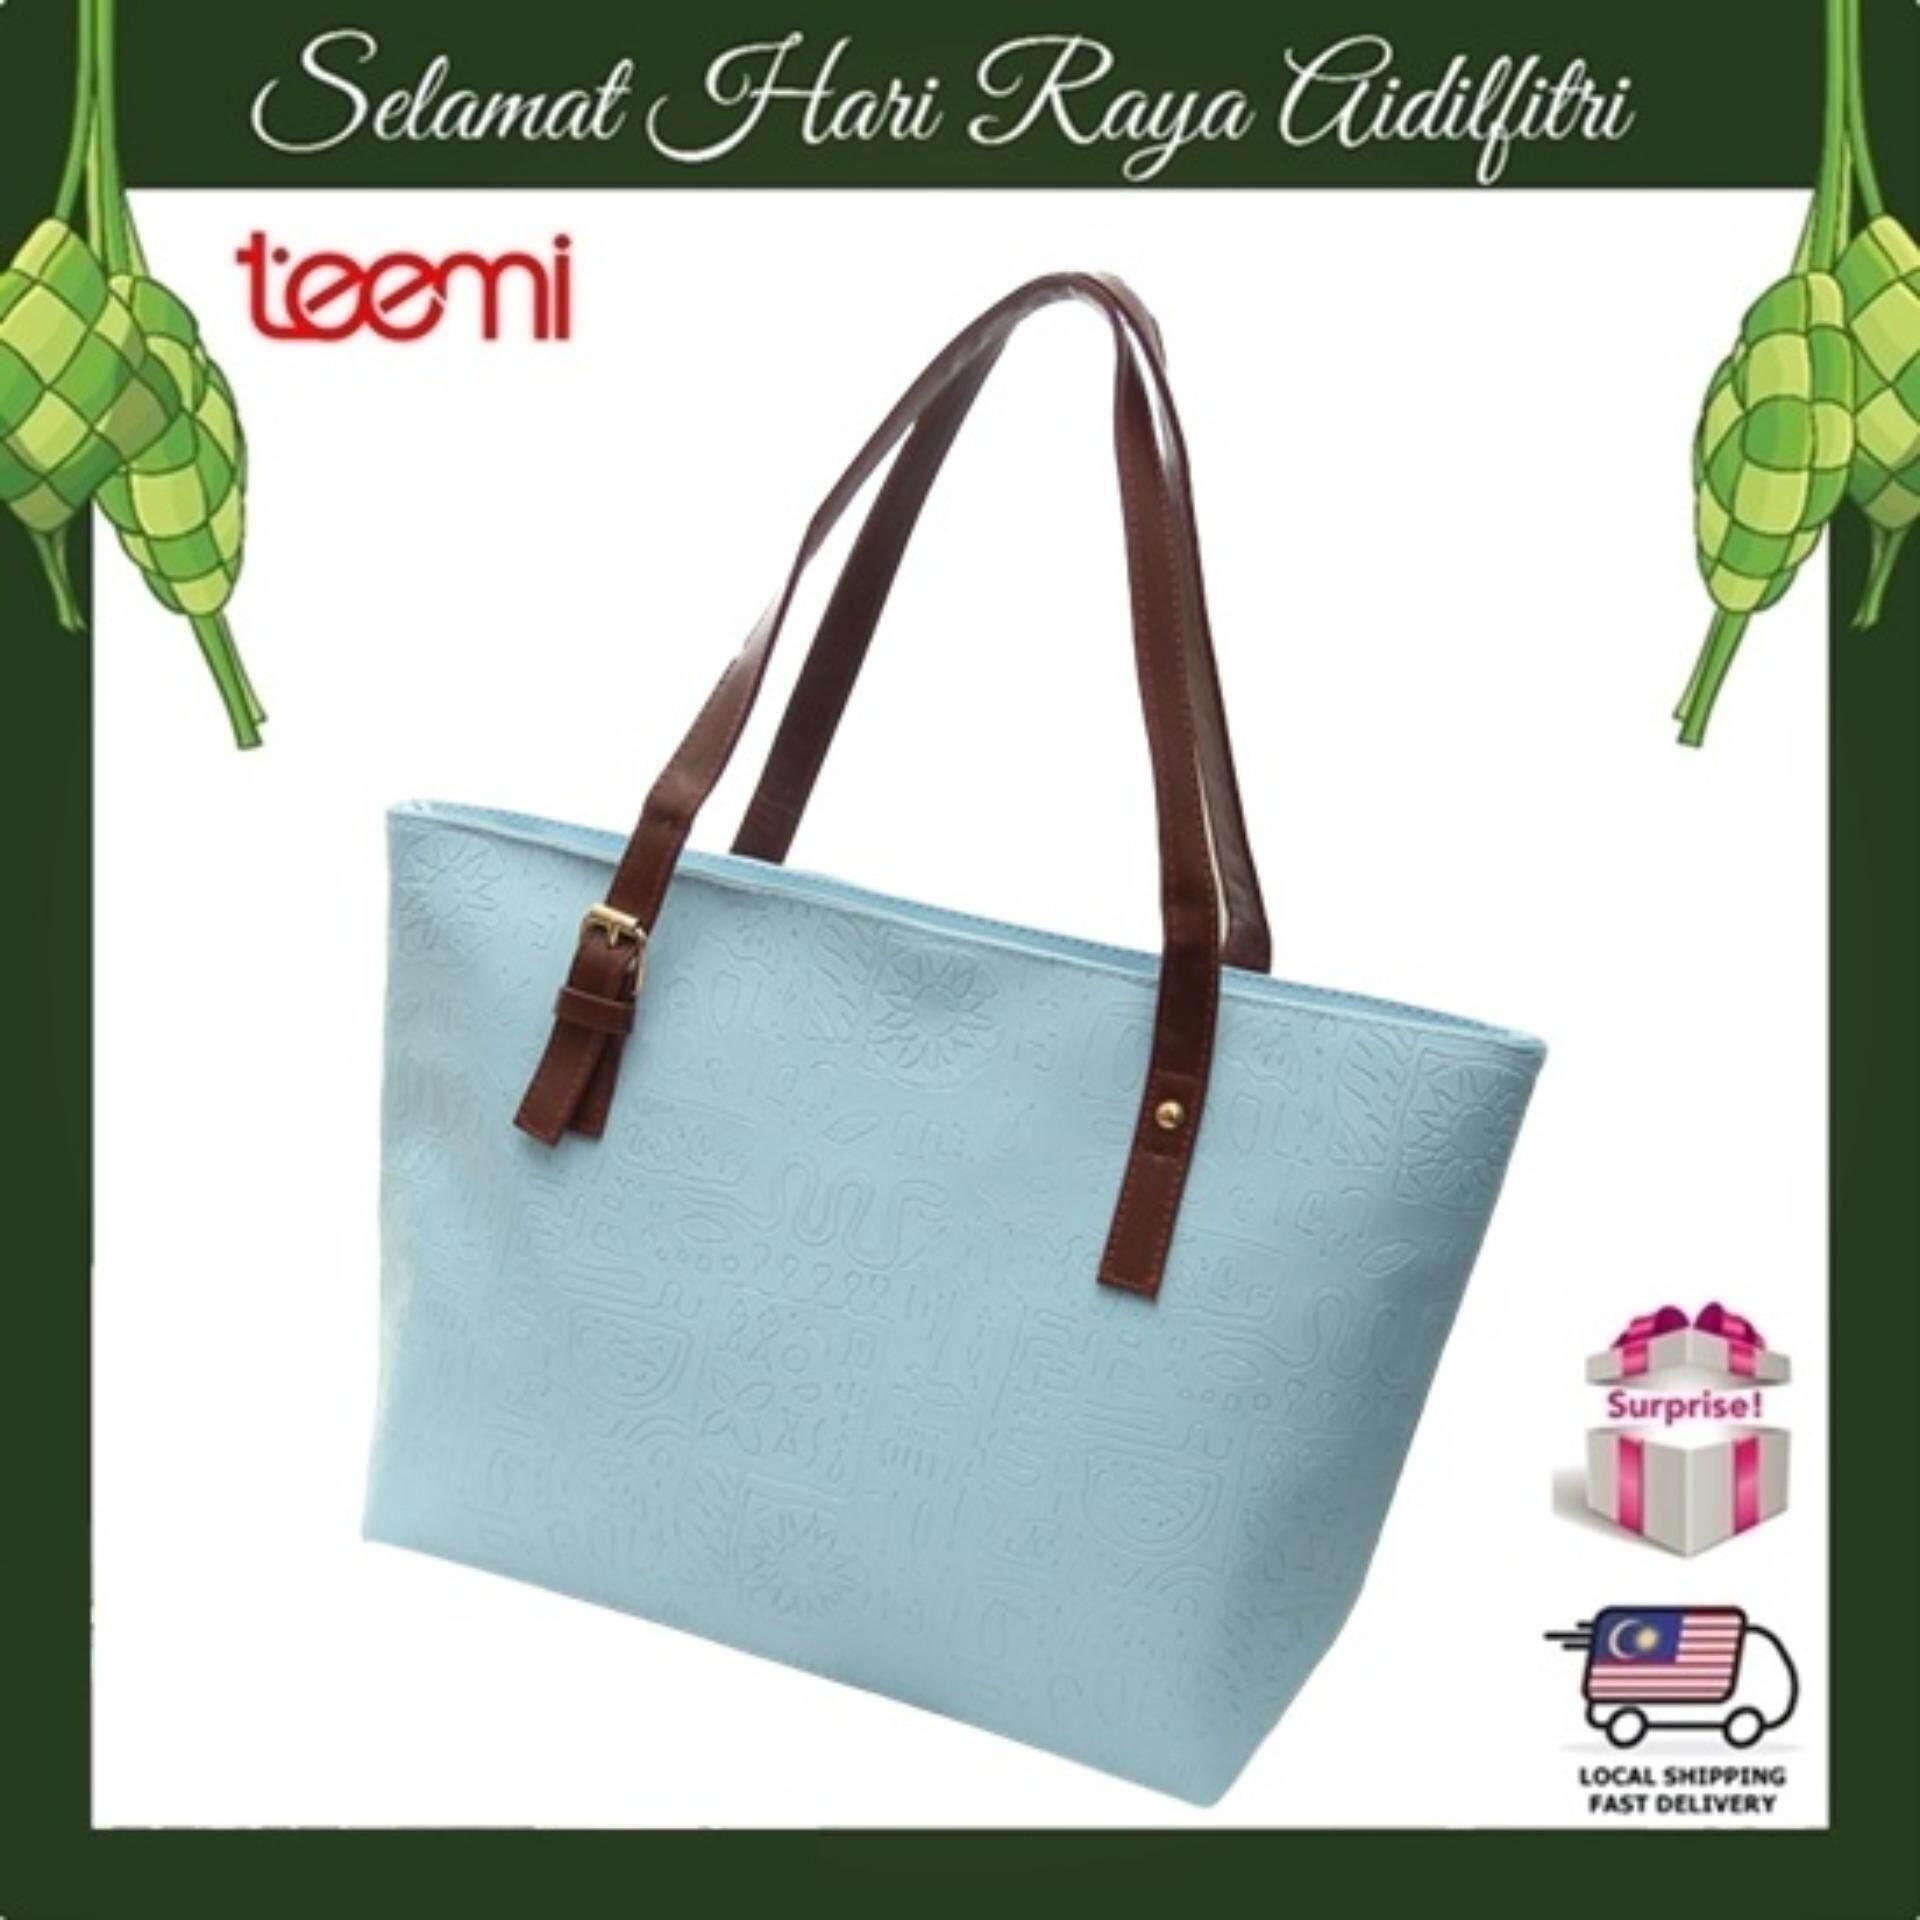 TEEMI Ancient Engraved Symbols Vintage Women PU Leather Large Tote Bag Adjustable Handle Top Zipper - Light Blue